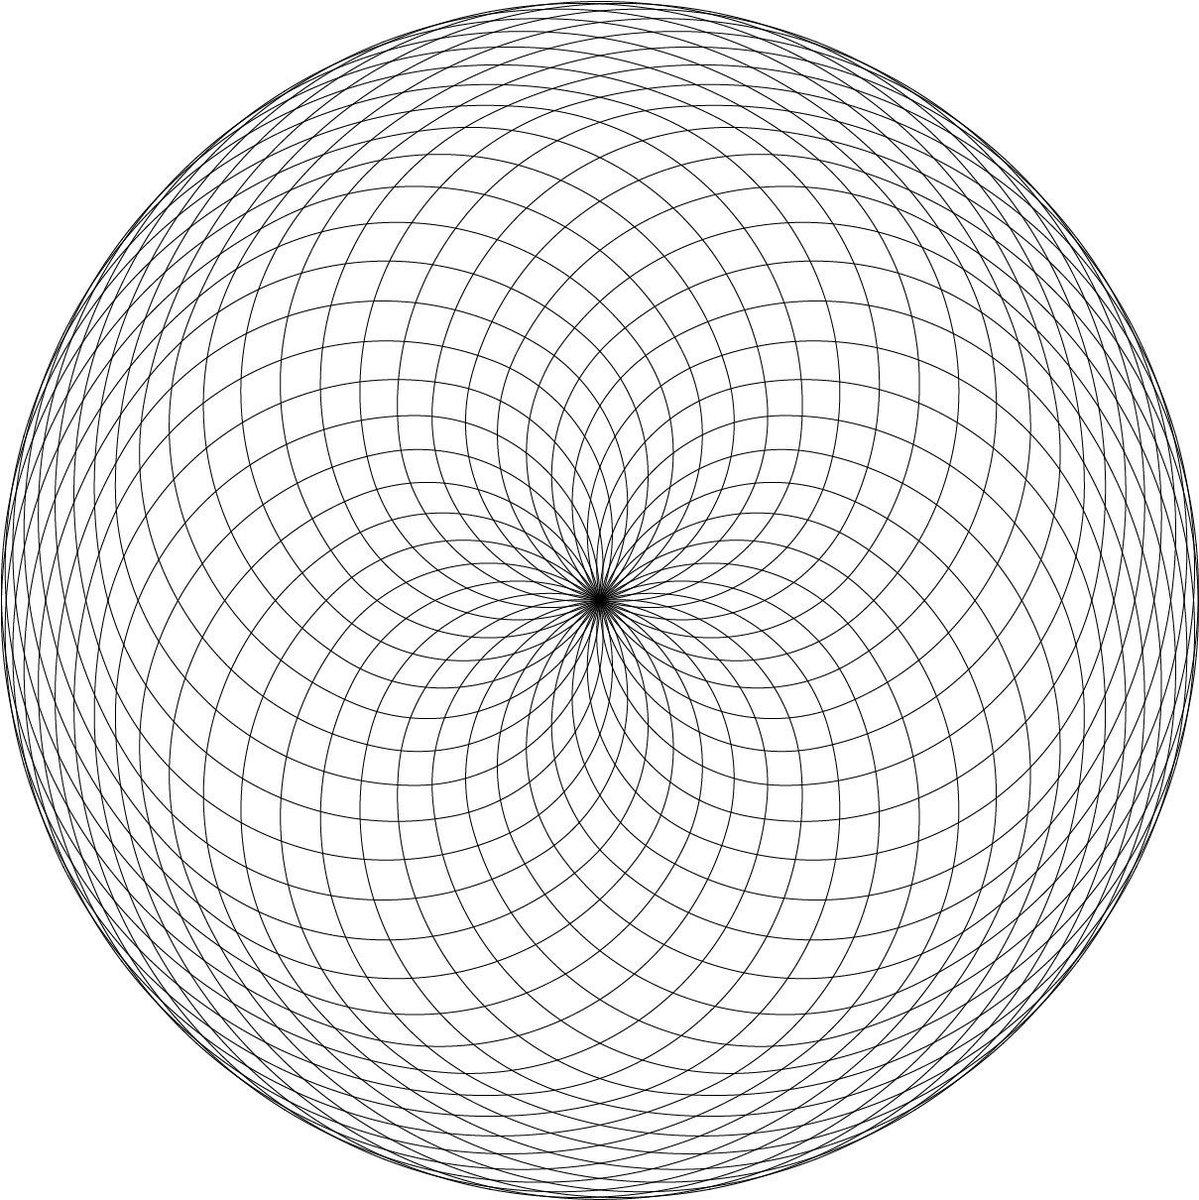 Spiral Drawing At Getdrawings